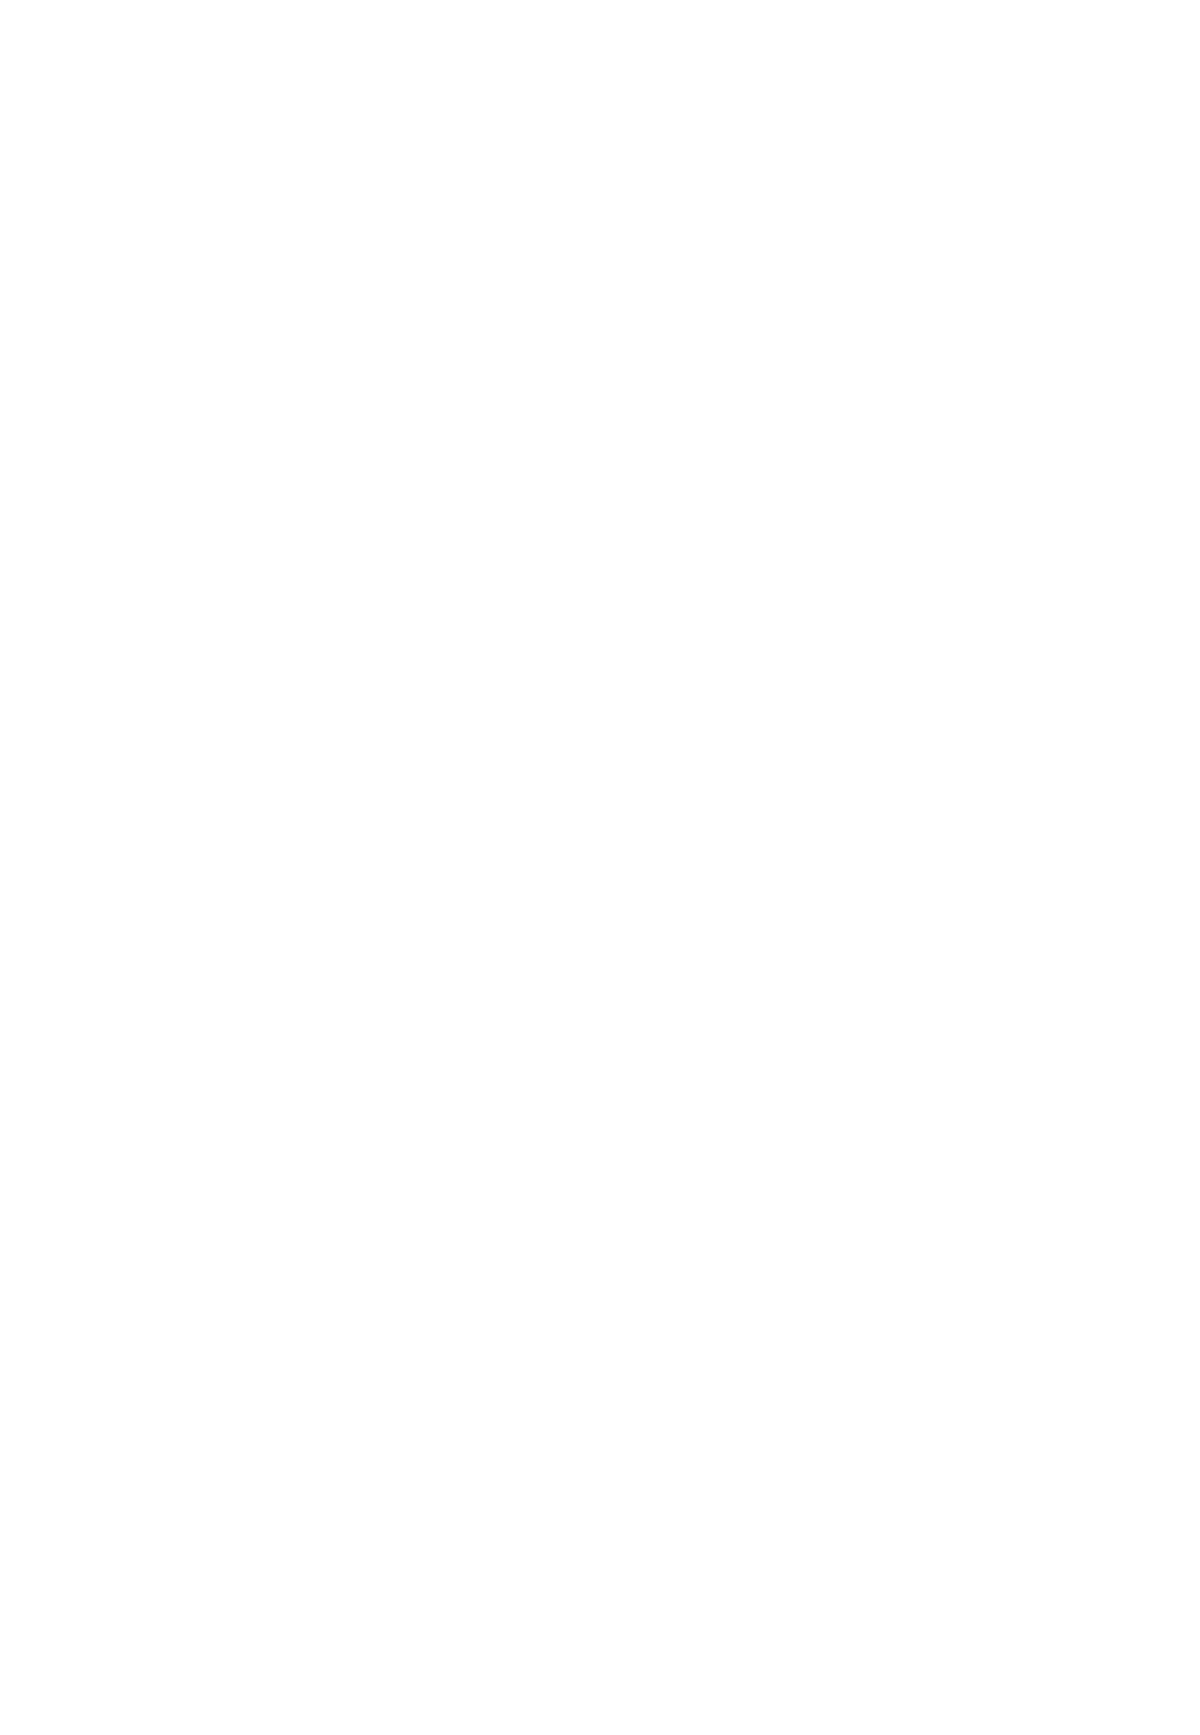 GPM.XXX Animation Moegiiro no Namida - Tear Drops 1